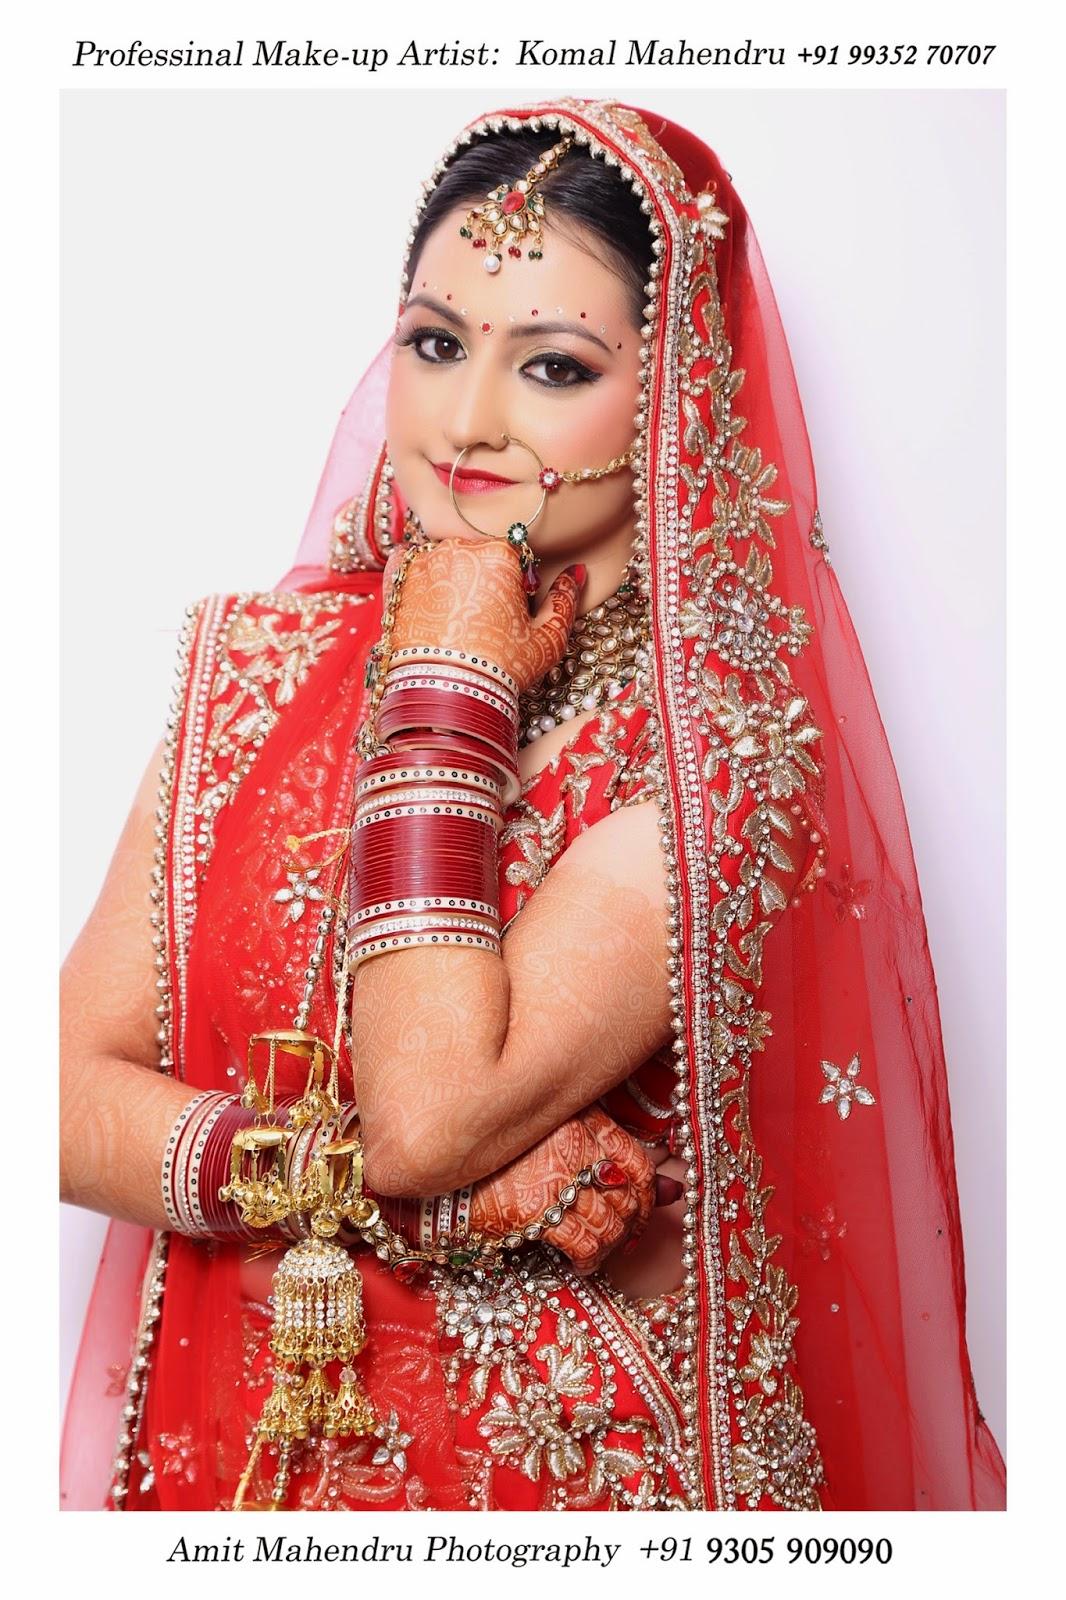 Komal mahendru s professional makeup lucknow india bridal makeup - Komal Mahendru S Professional Makeup Lucknow India Bridal Makeup Beauty Salon Hair Salon